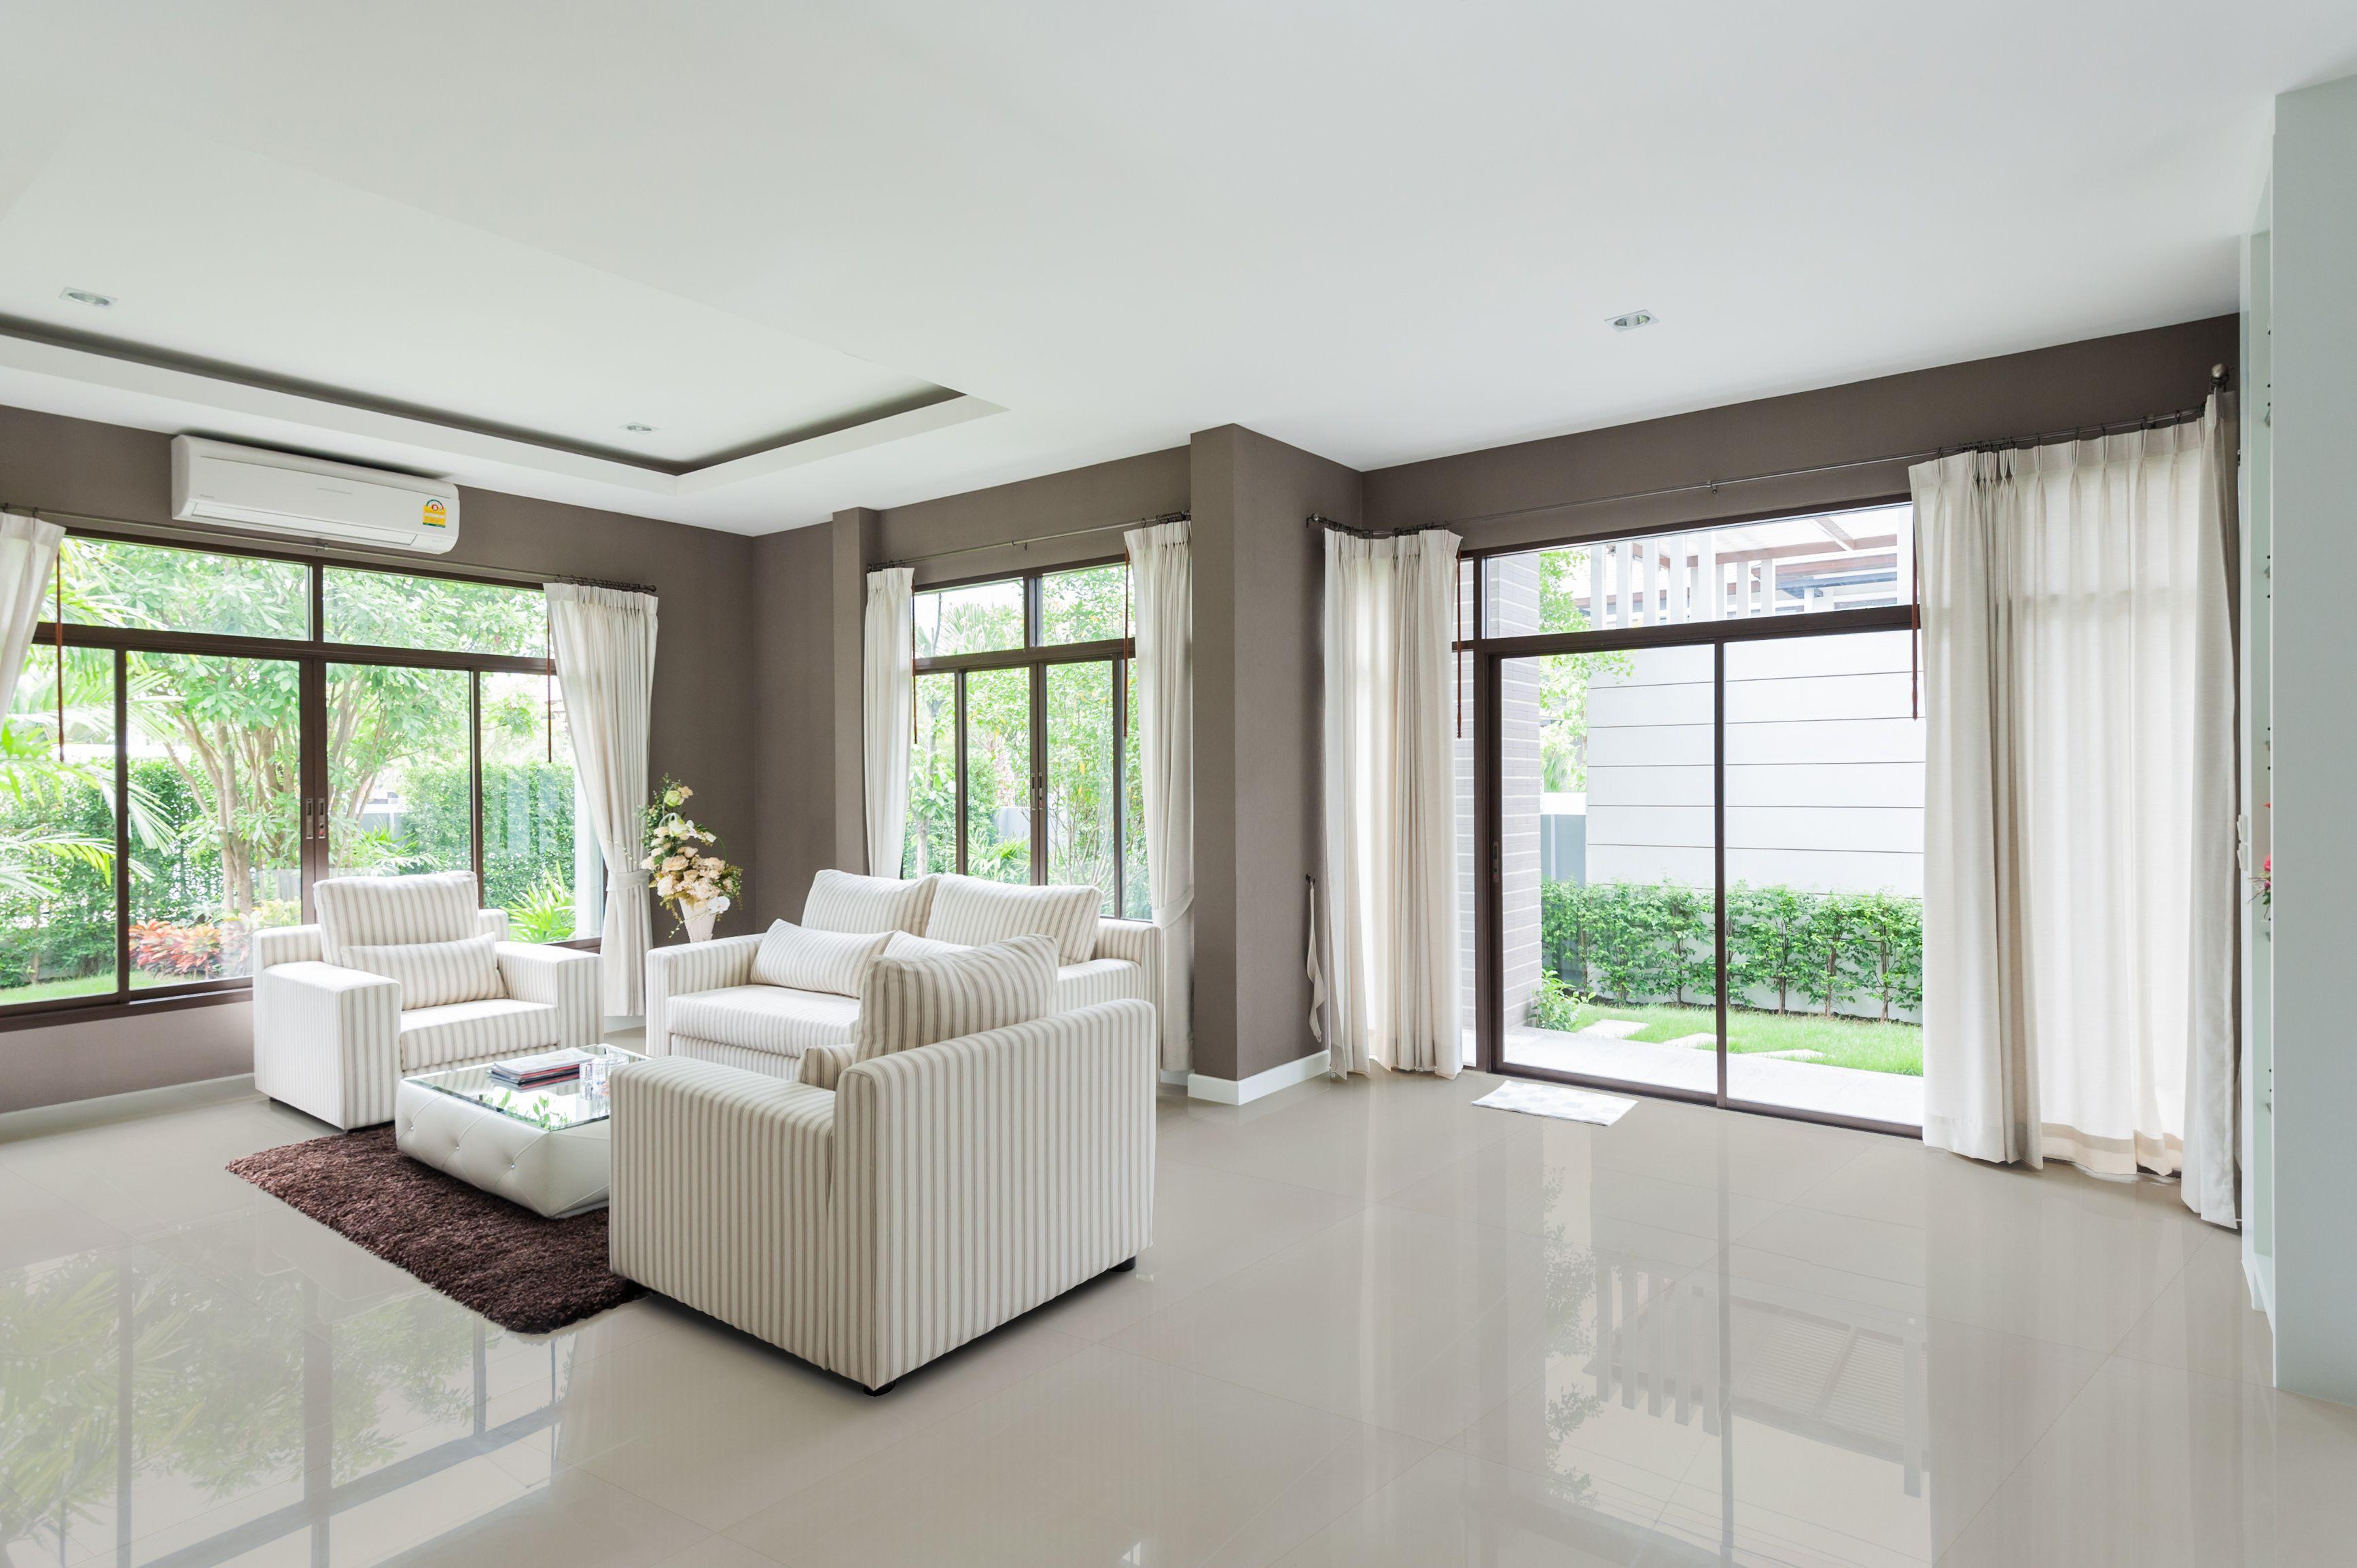 Porcelanato Vorio Super Gloss Polido Retificado 60 X 60 Delta  -> Sala Com O Piso Porcelanato Polido Cinza